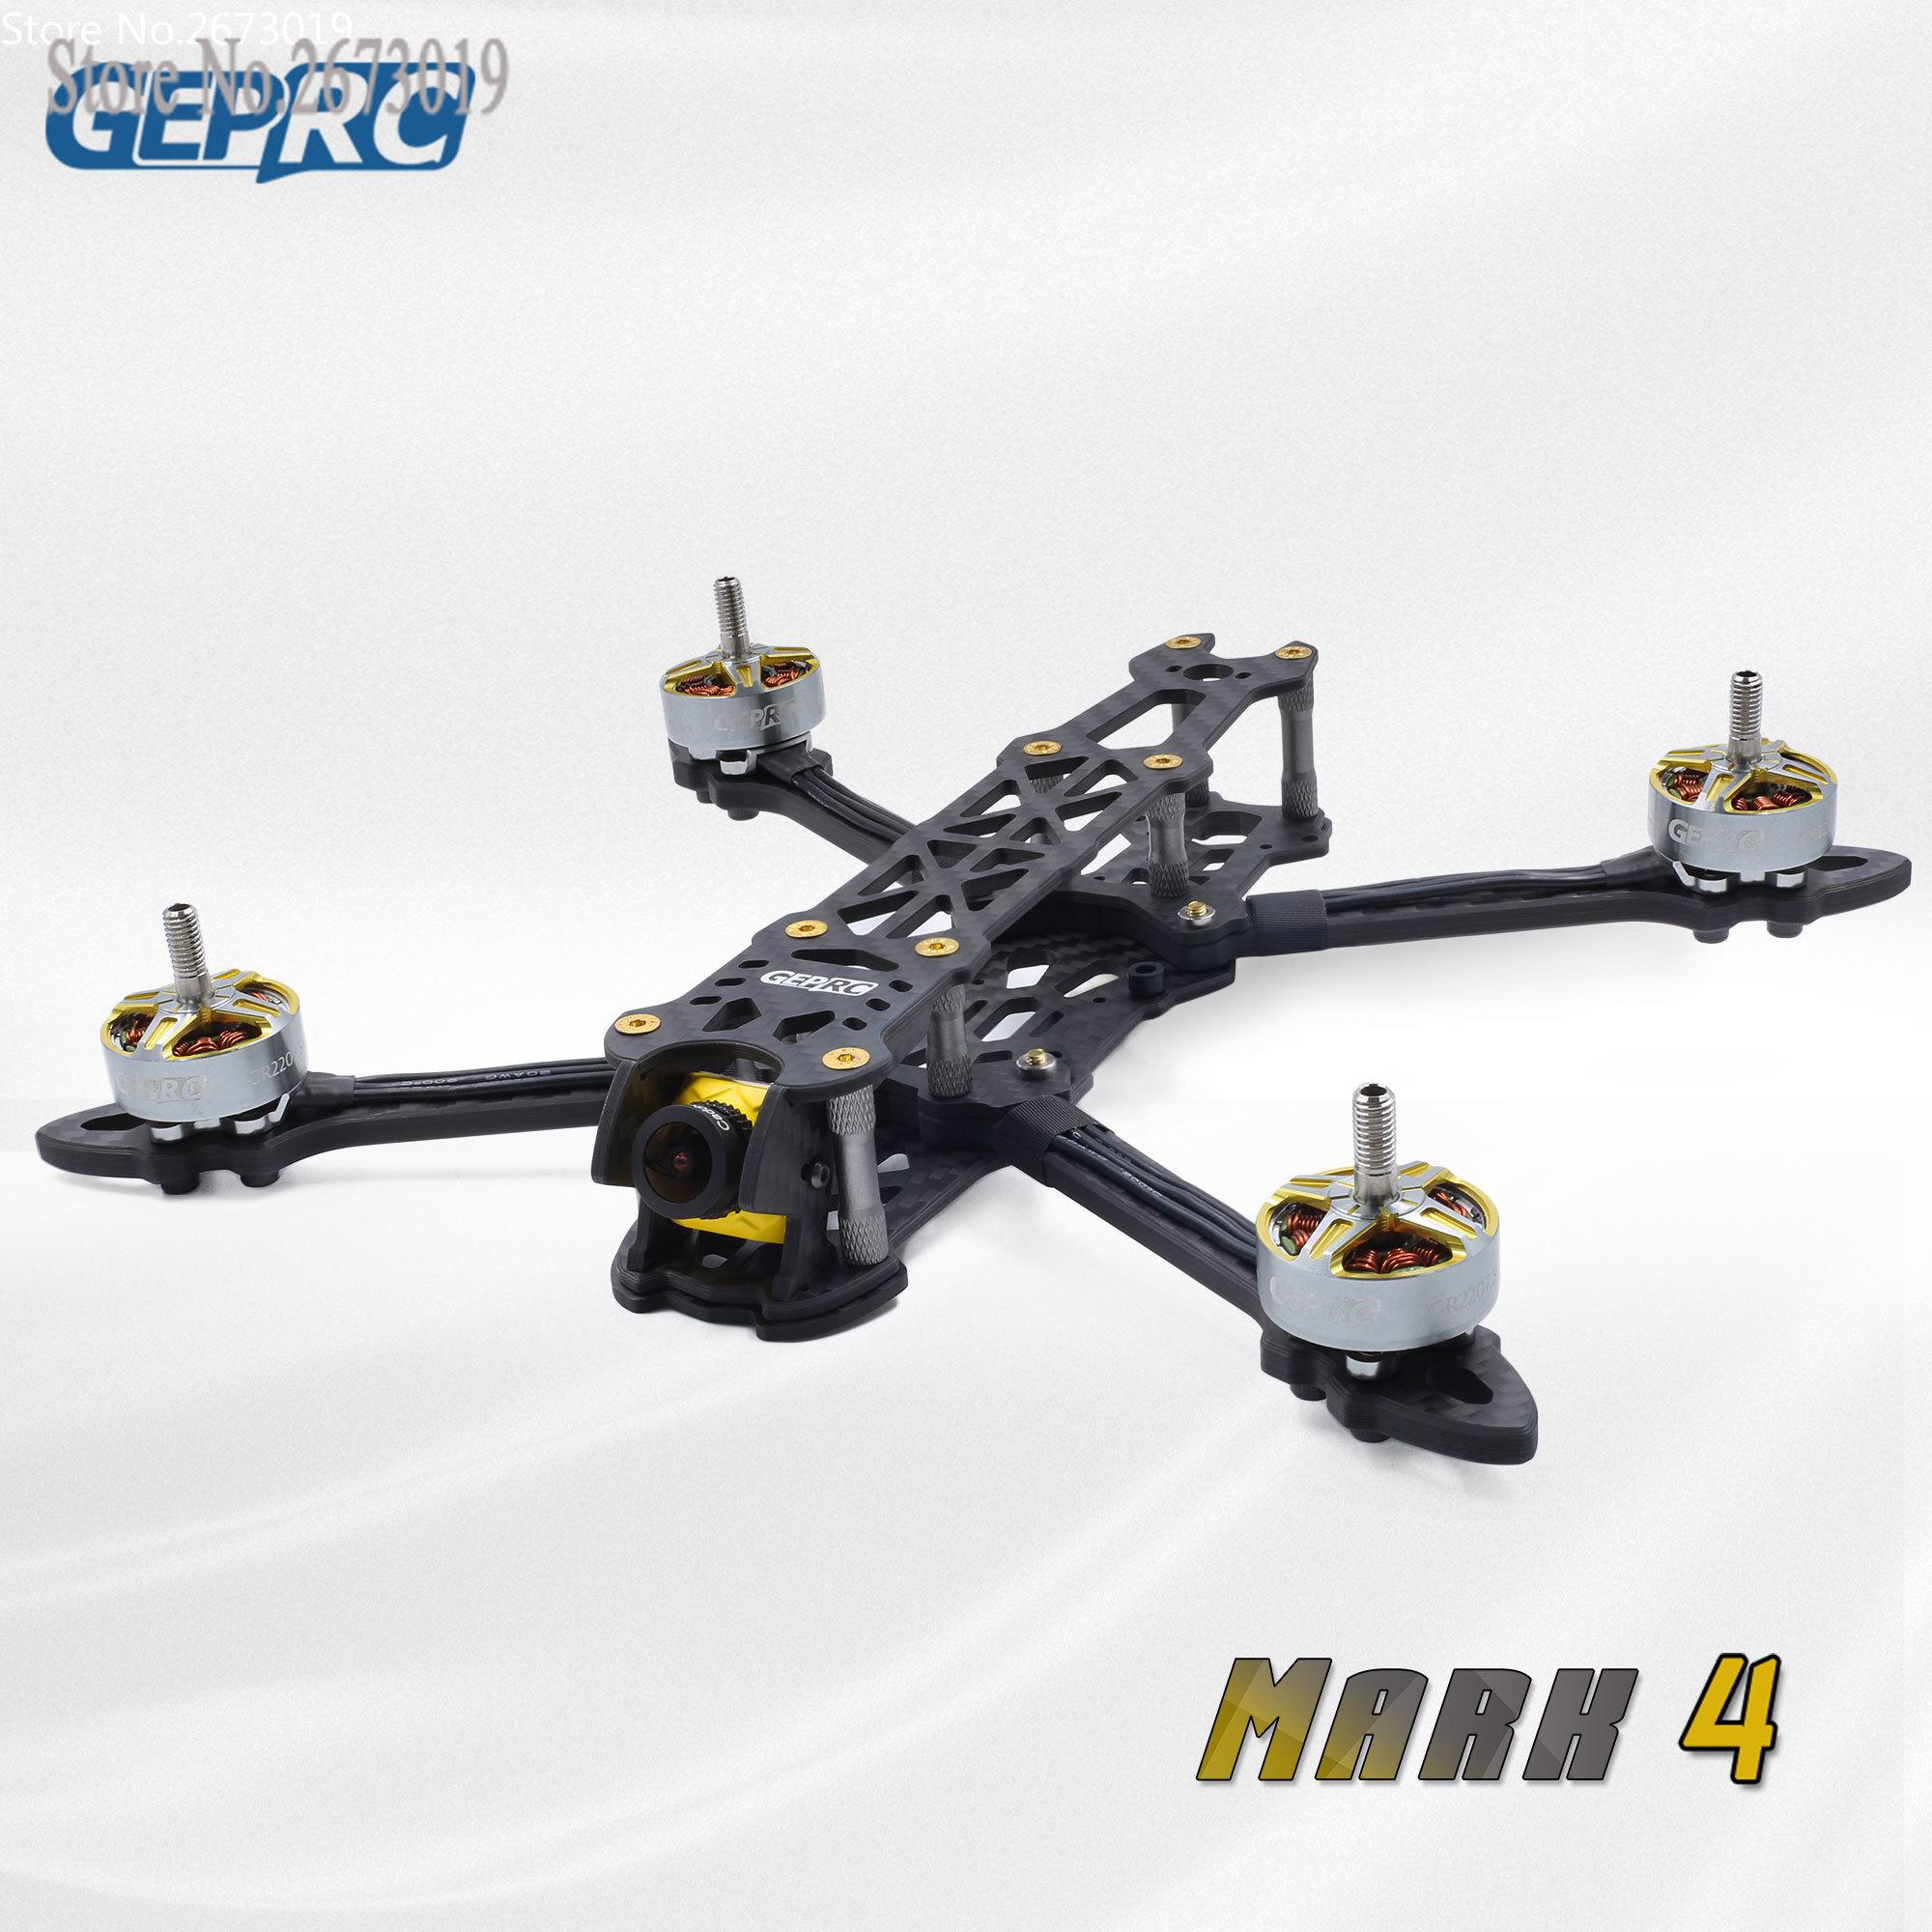 Рама для гоночного дрона GEPRC Mark 4 FPV, 5 /6/7 , рама для квадрокоптера 5 мм, кронштейн с крепежными отверстиями 30,5*30,5/20*20 мм для FC